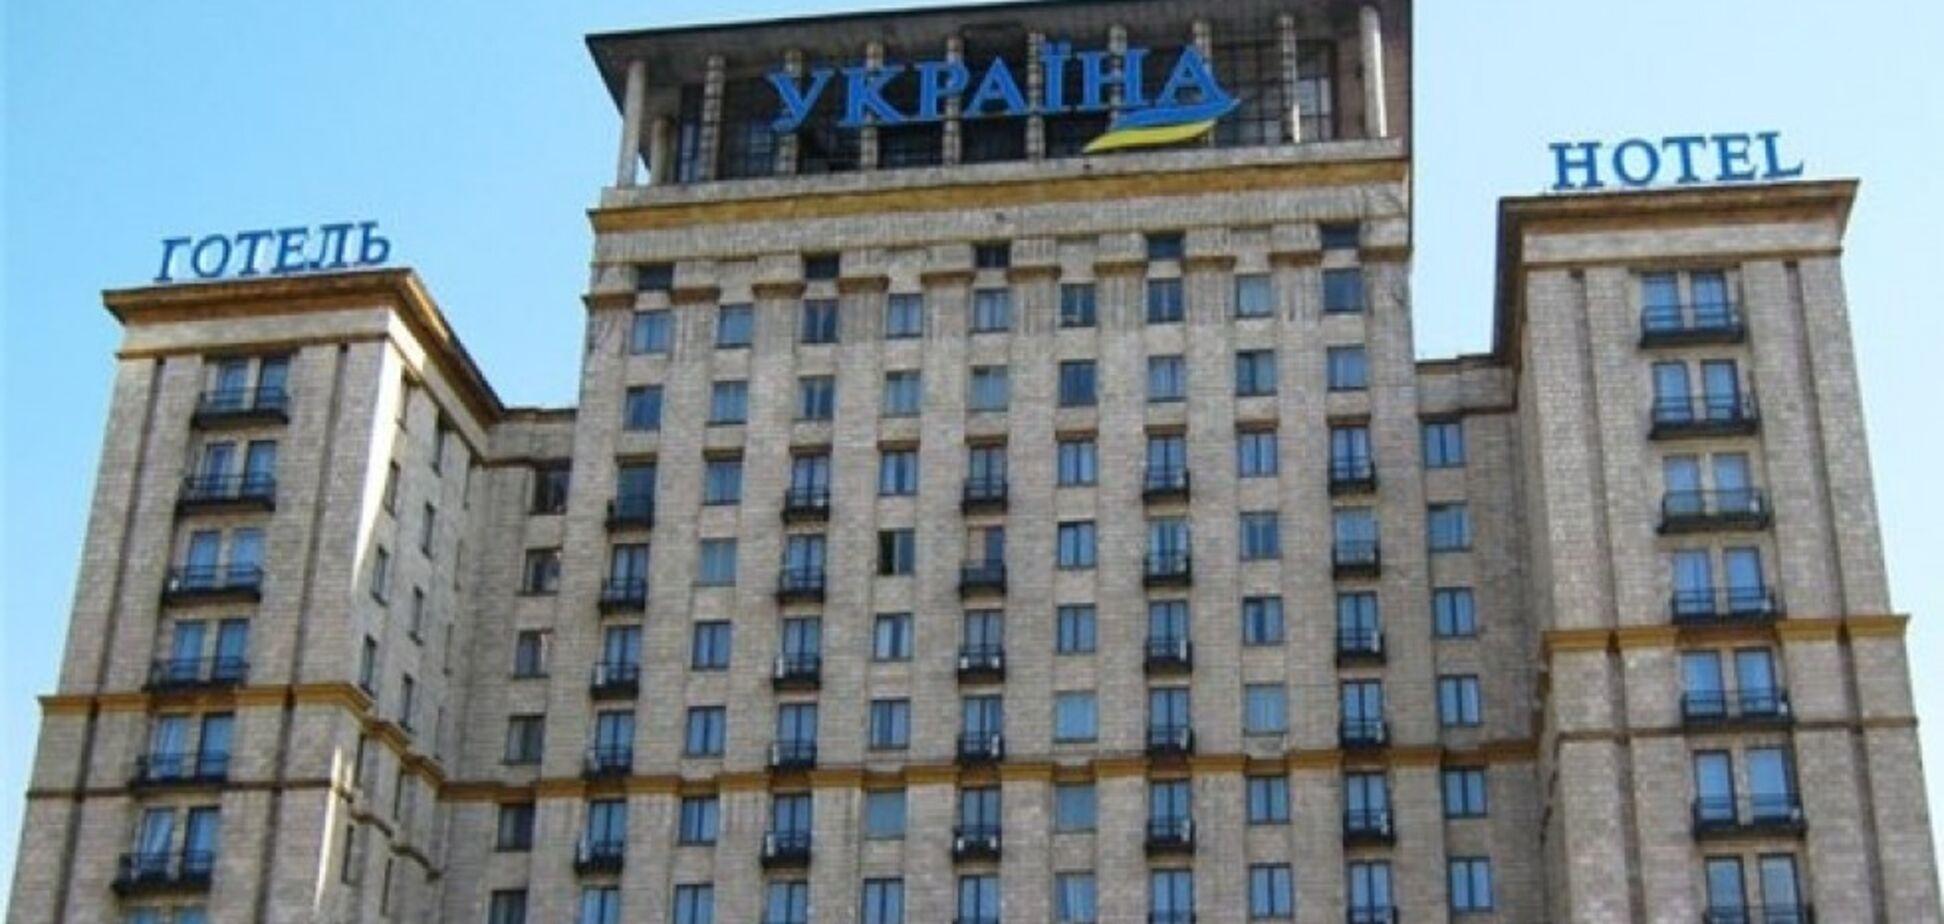 Розстріл Майдану: ГПУ отримала кулі зі стін готелю 'Україна'